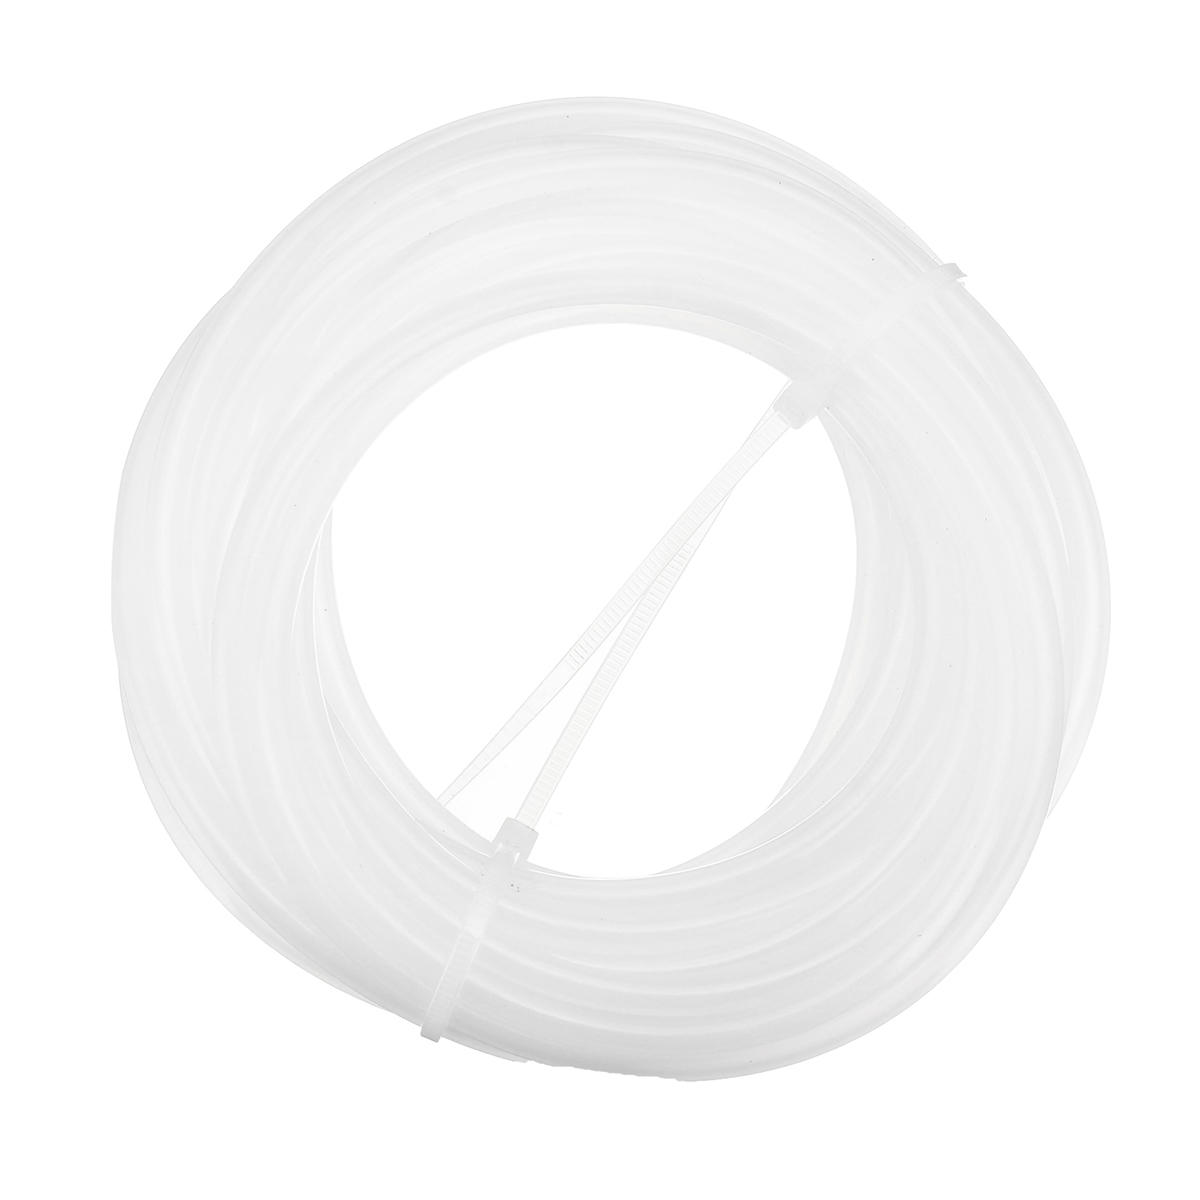 Eberspacher Fuel longitud 4m 1.5mm ID White Air Water Calentador Pipe